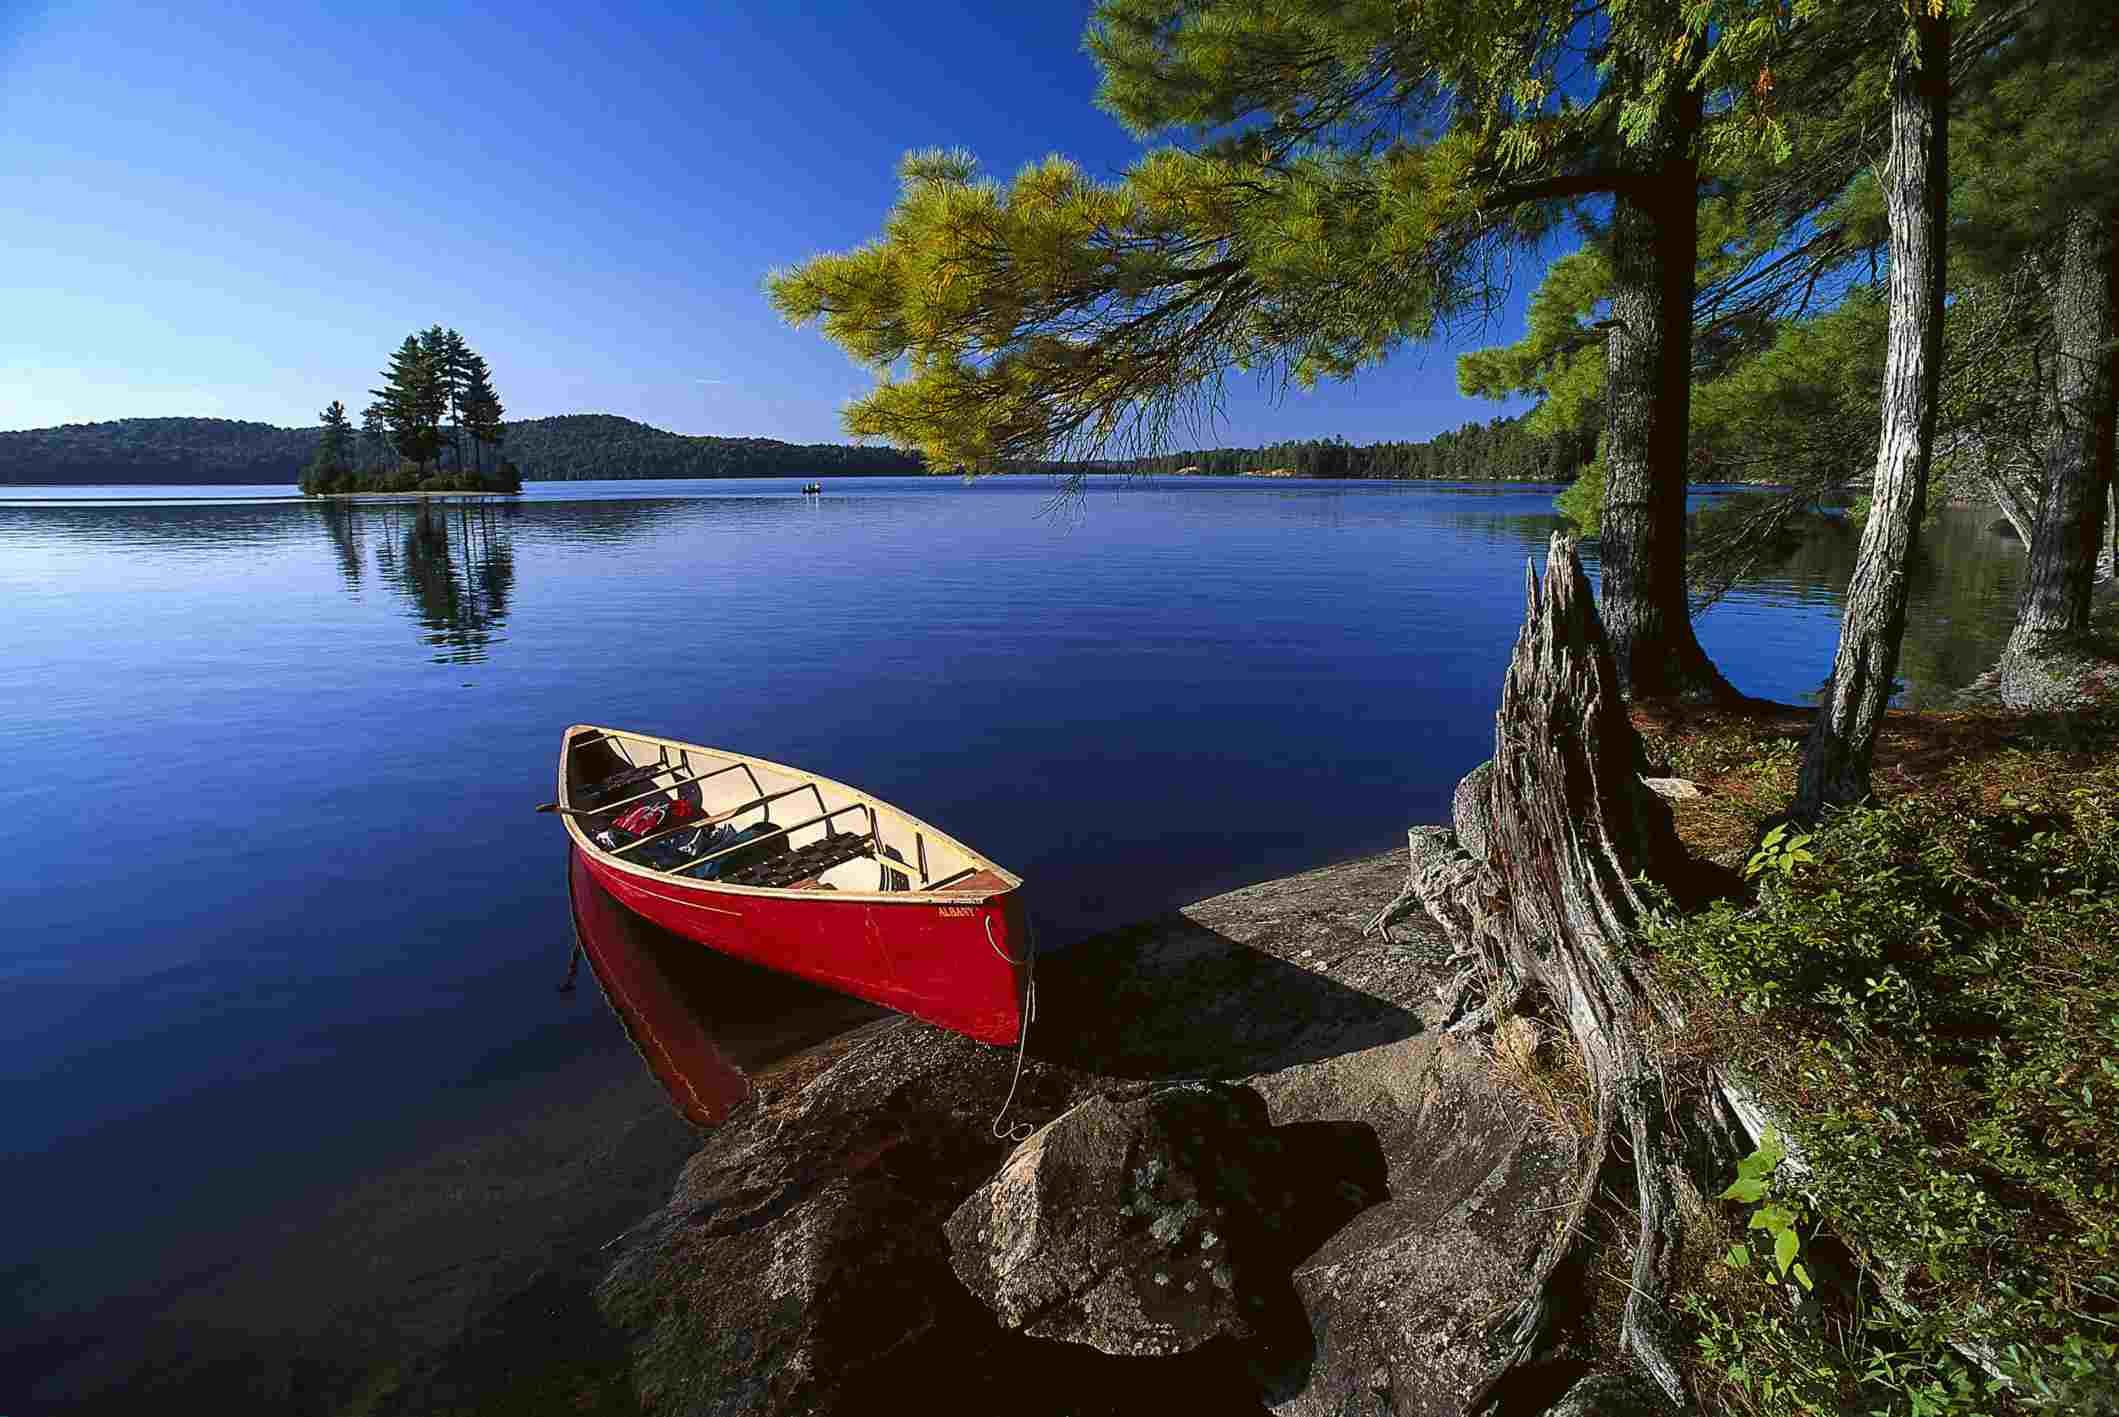 Lake Opeongo in Algonquin Provincial Park, Ontario, Canada.